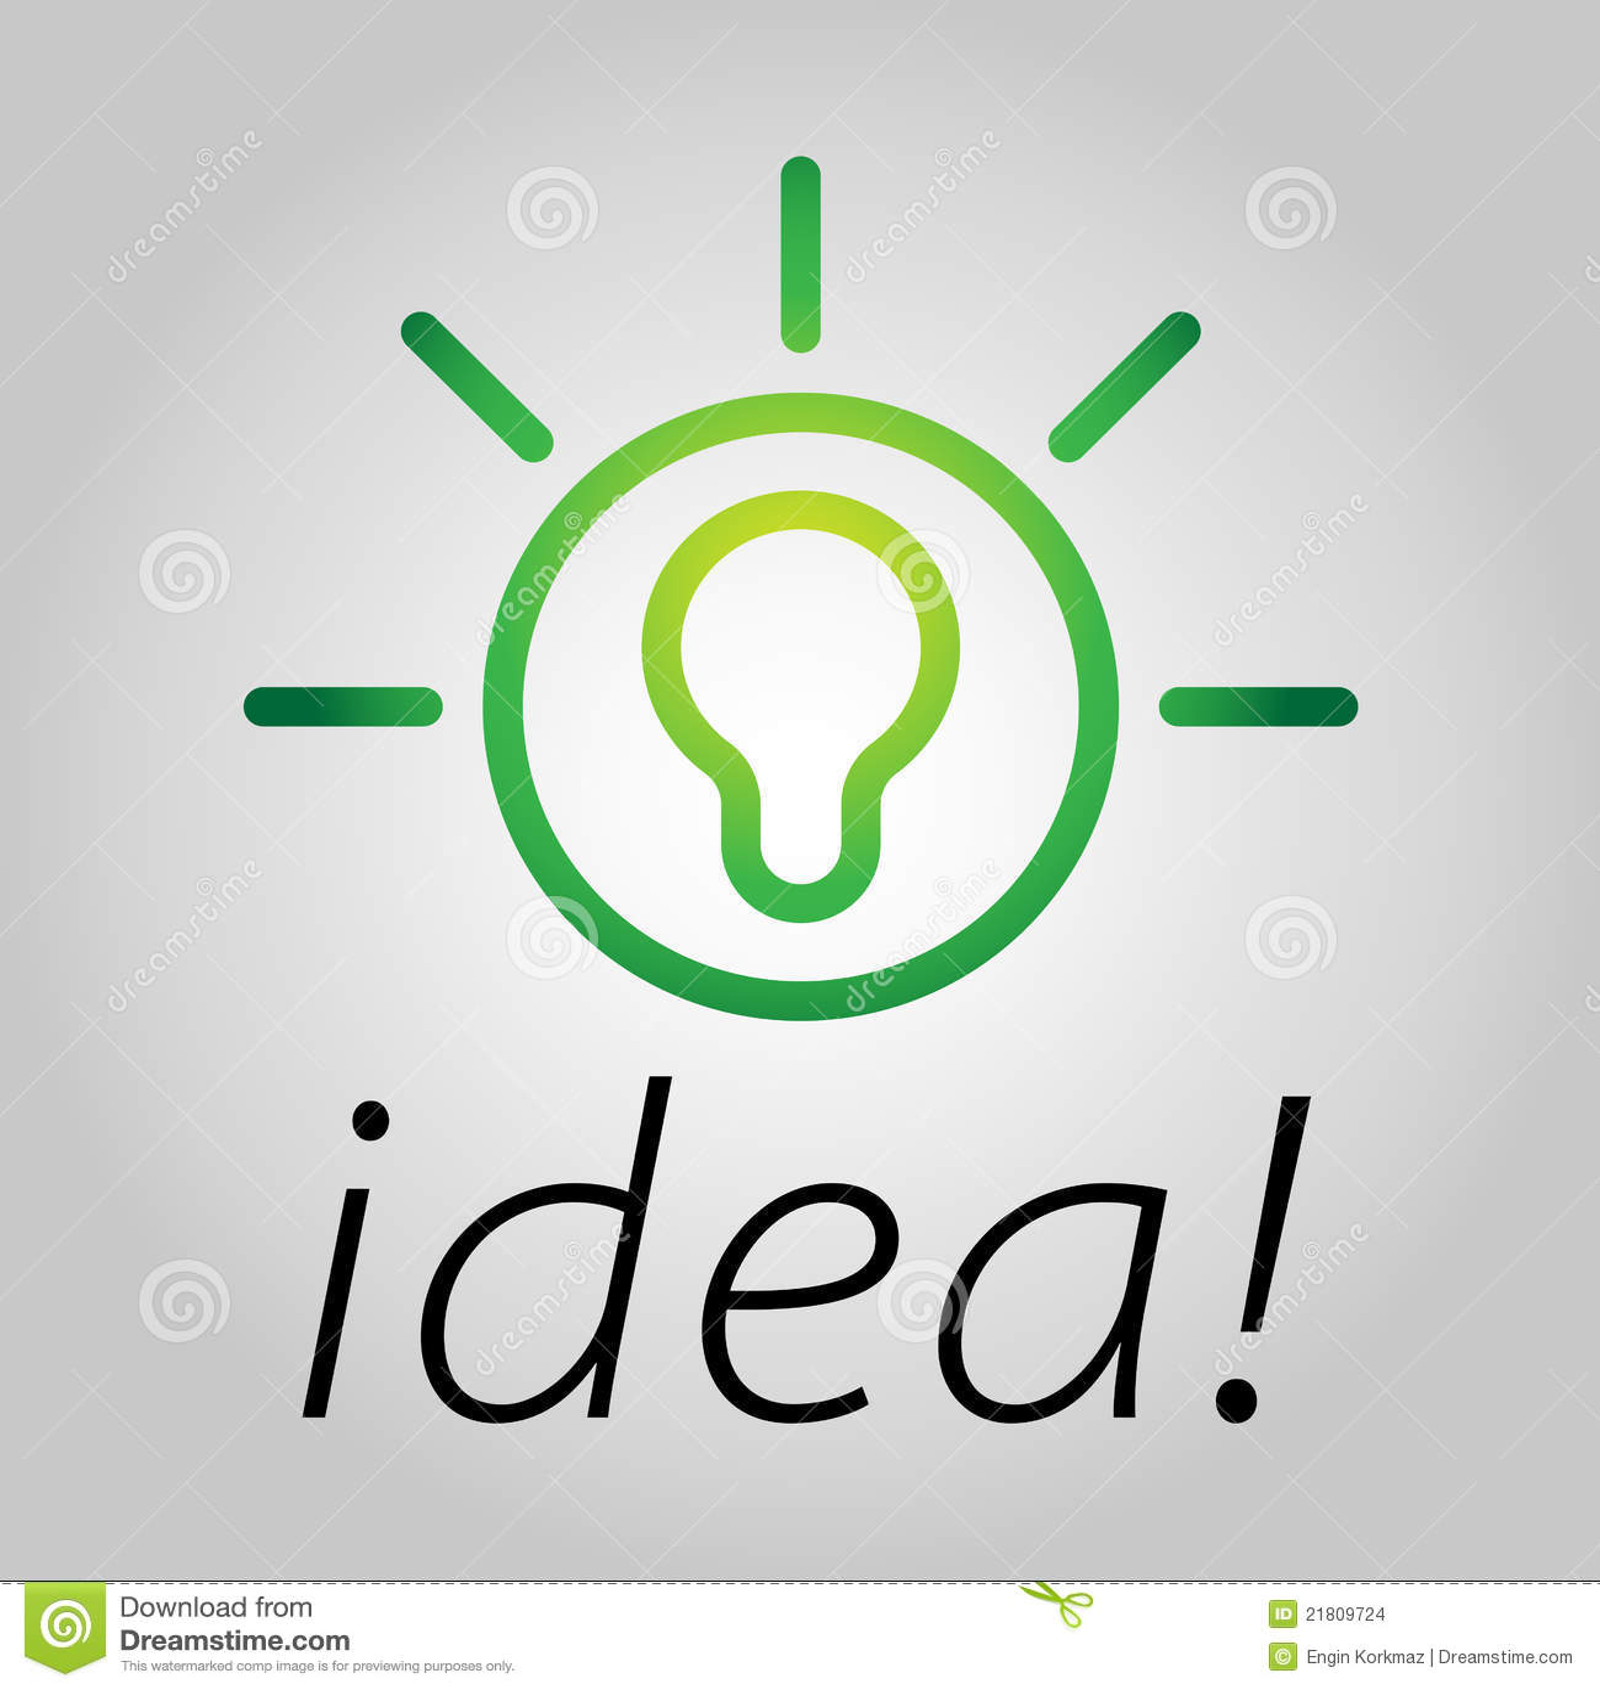 Bright Idea Stock Images - Image: 21809724